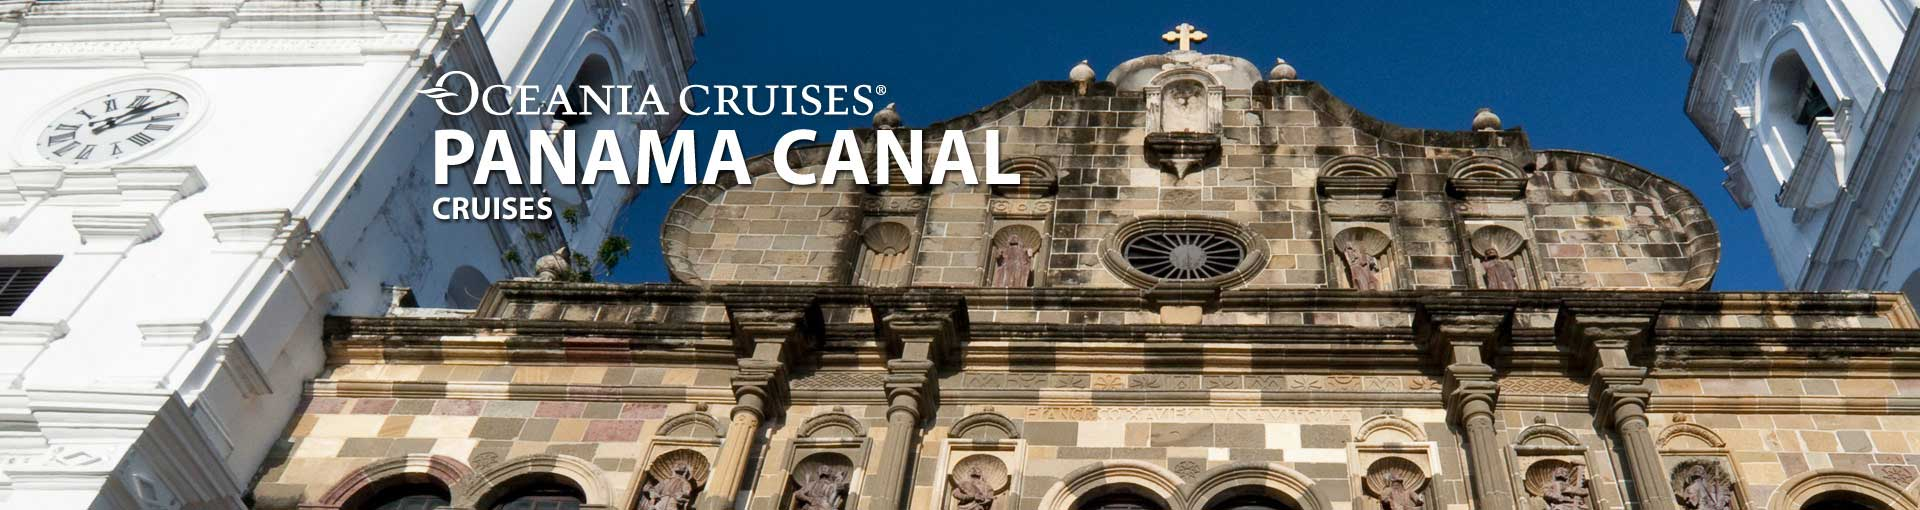 Oceania Cruises Panama Canal Cruises